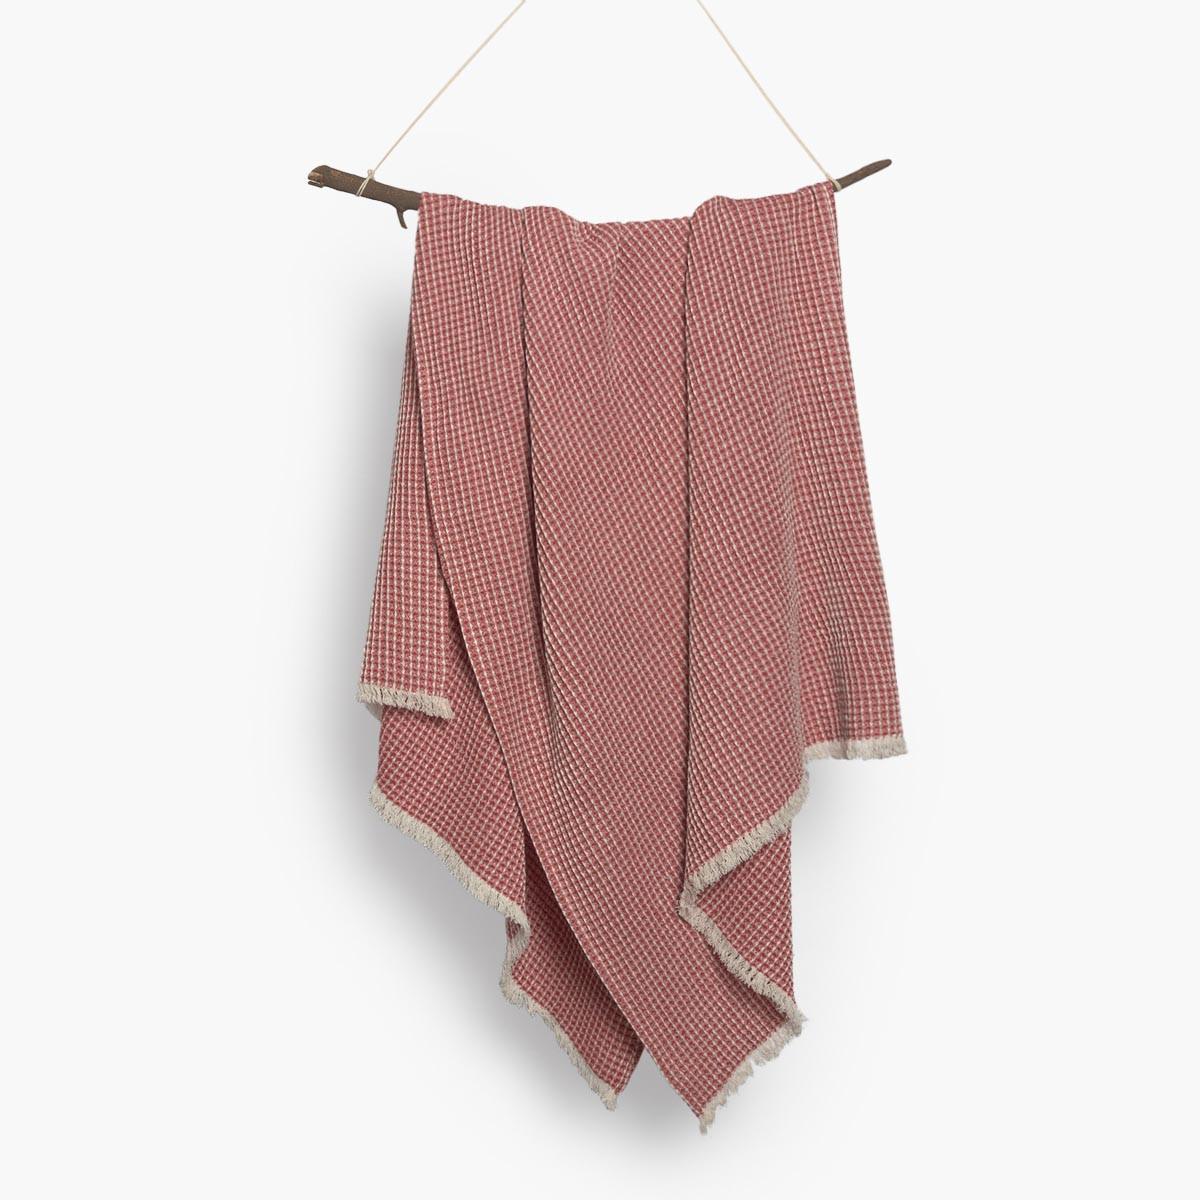 Strandtuch Cerezo | 180 x 100 cm | Rot